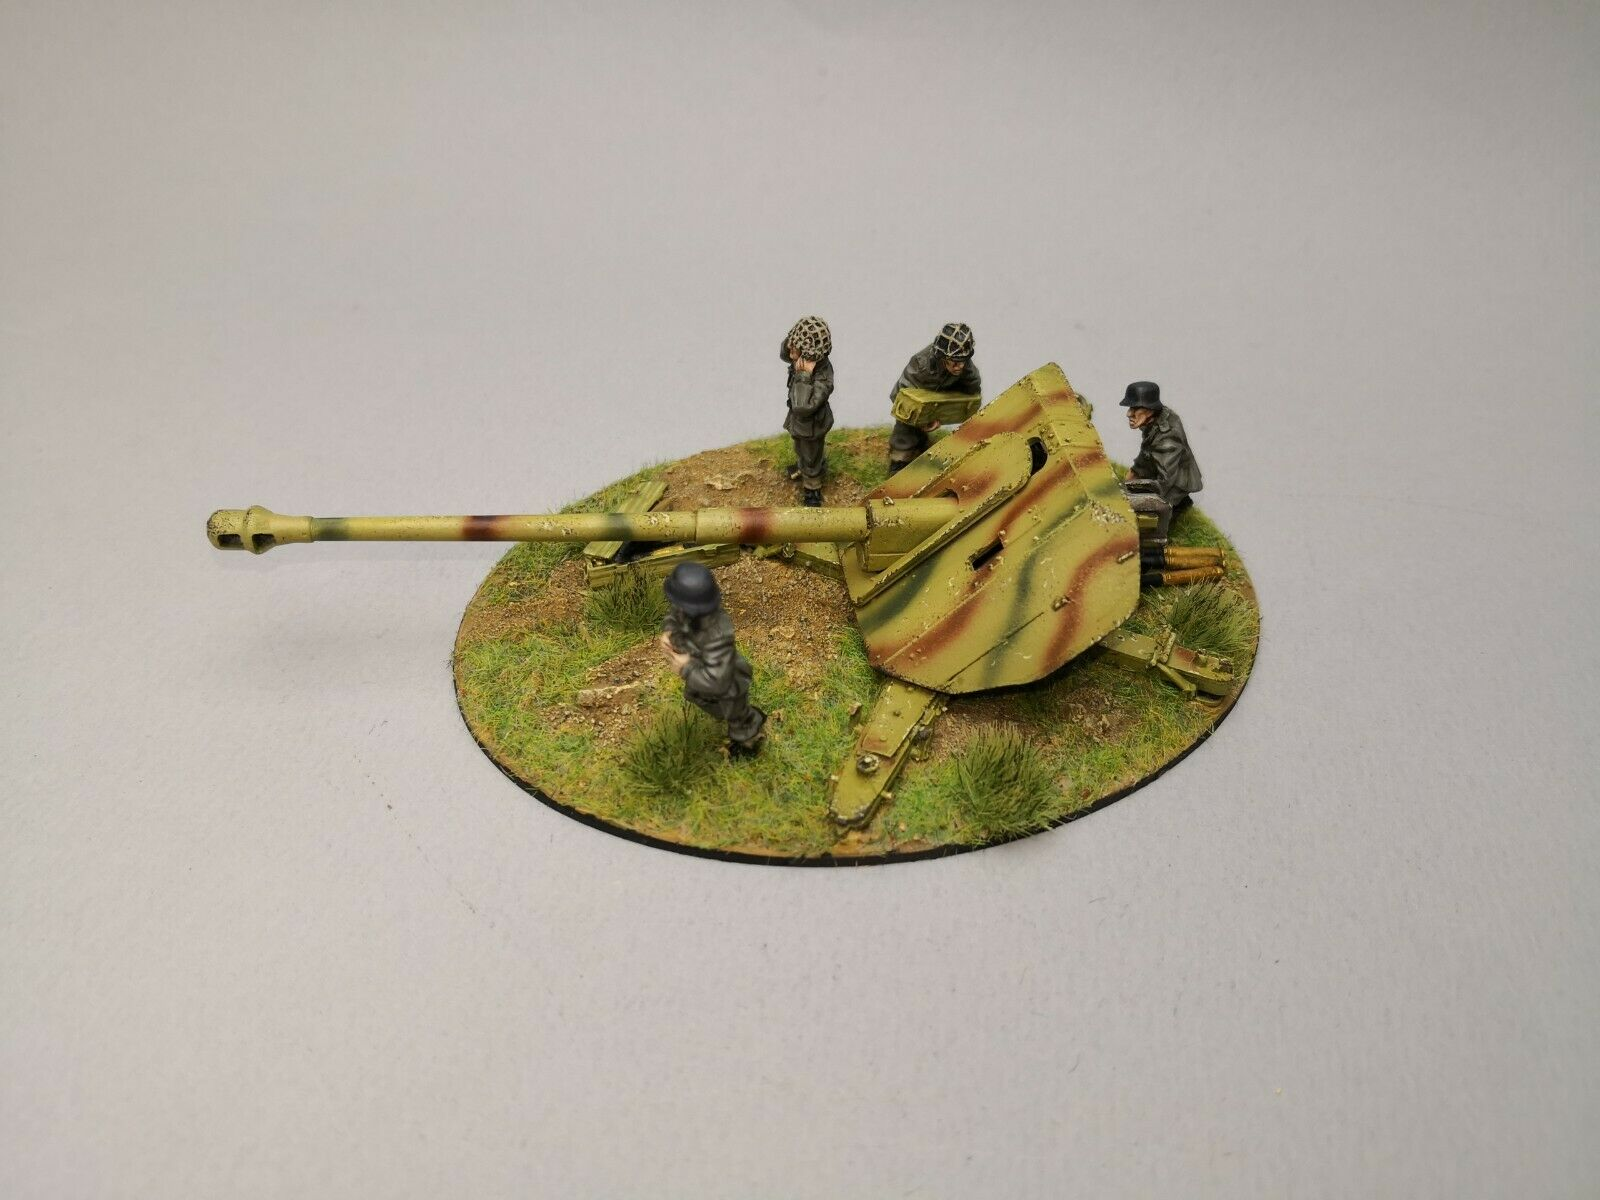 German 88mm PaK 43 Heavy Anti-tank gun WW2 28mm Bolt Action Pro Painted